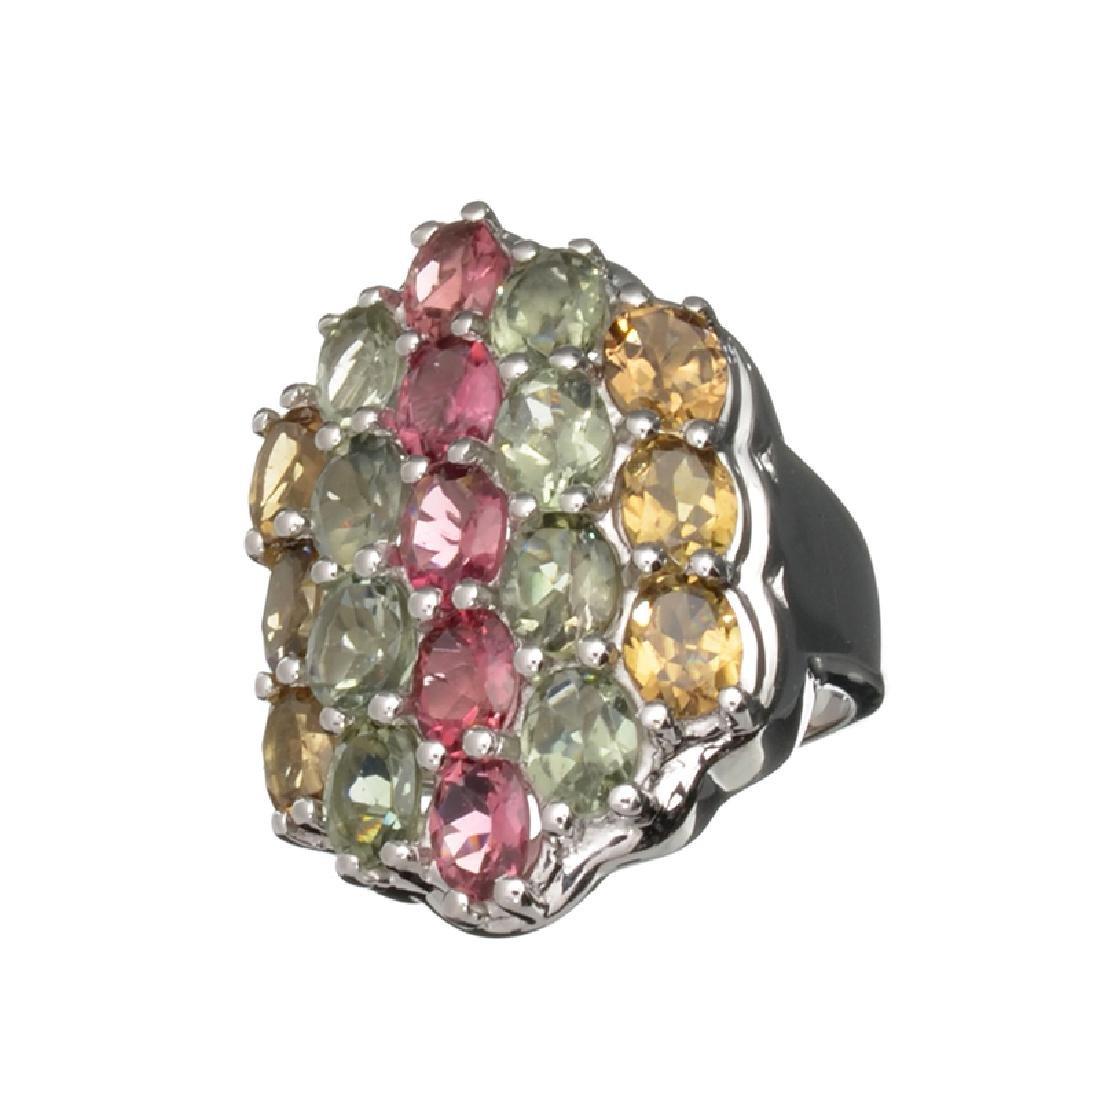 6.36CT Oval Cut Multi-Colored Multi Precious Gemstones